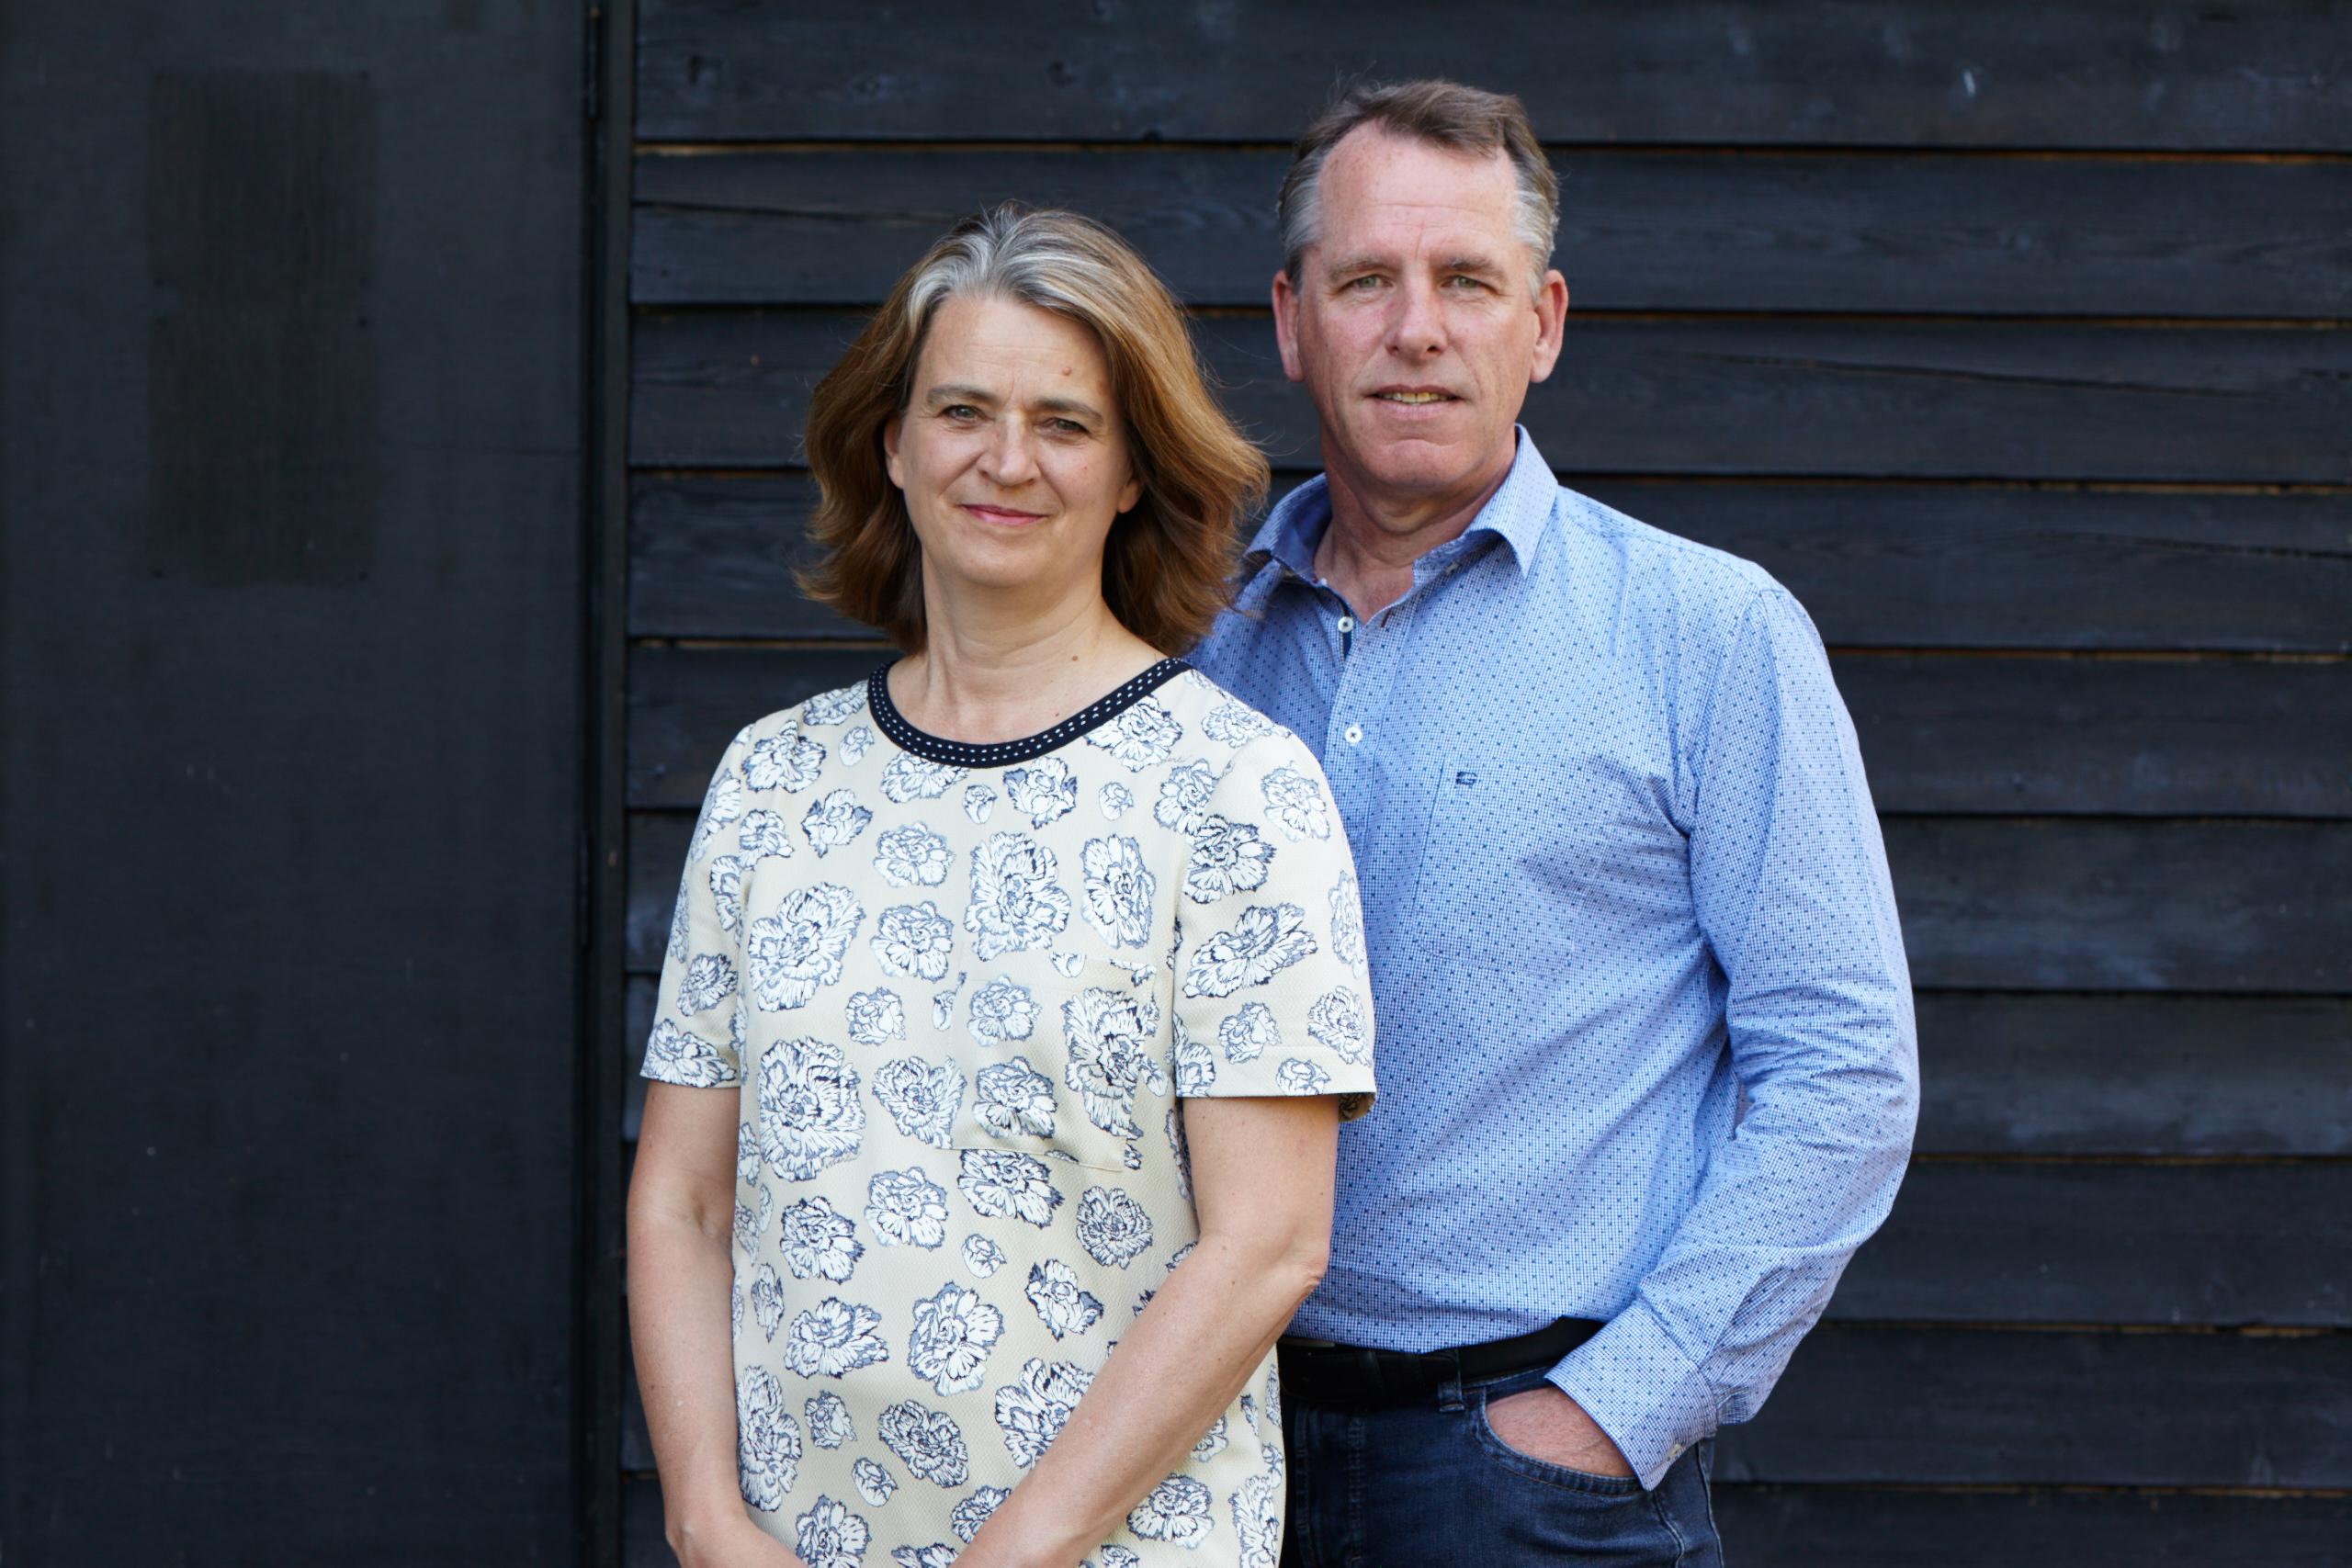 Rosalind Dewar and Tim Green